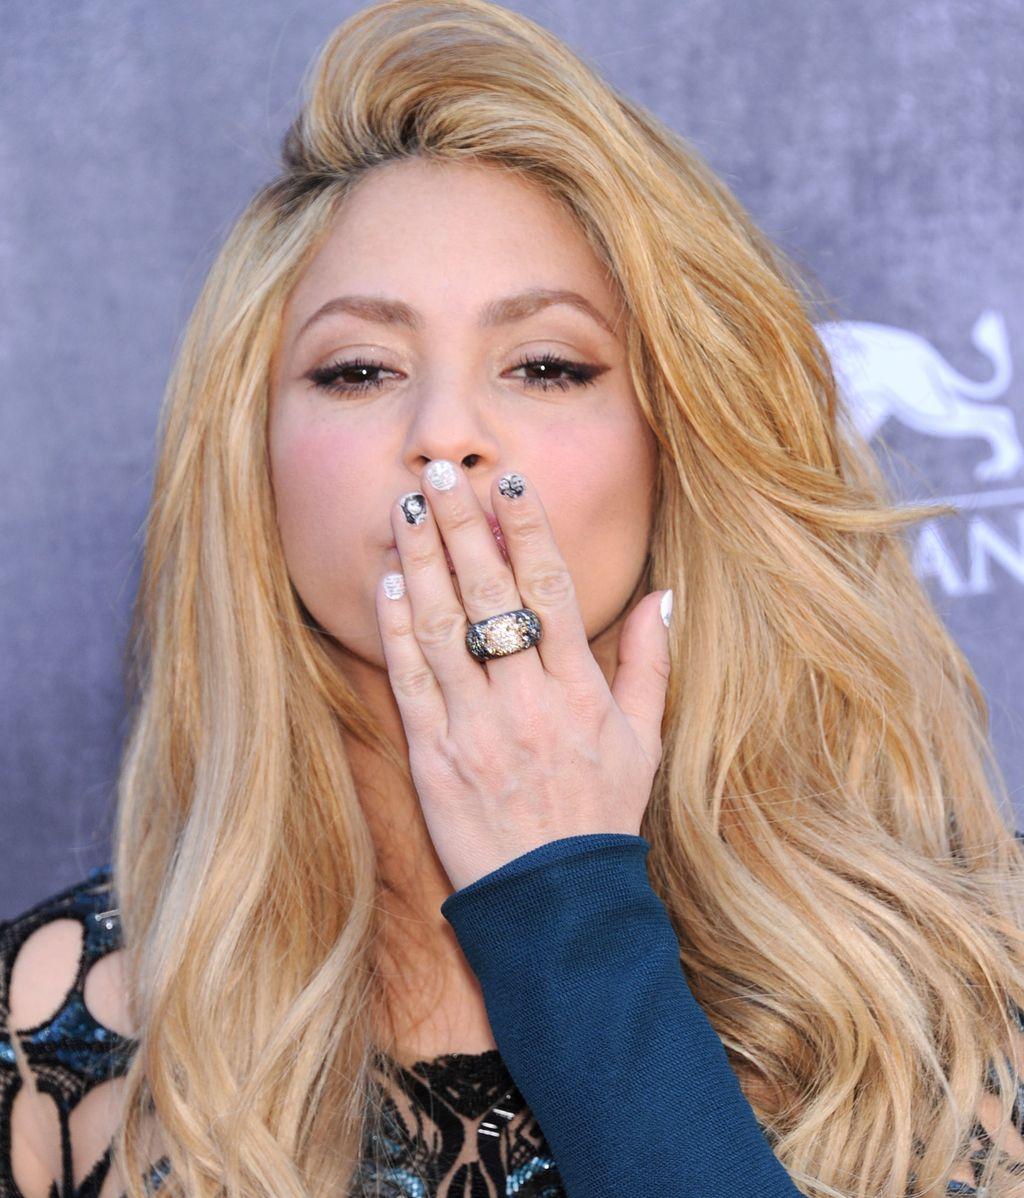 La misteriosa manicura de Shakira